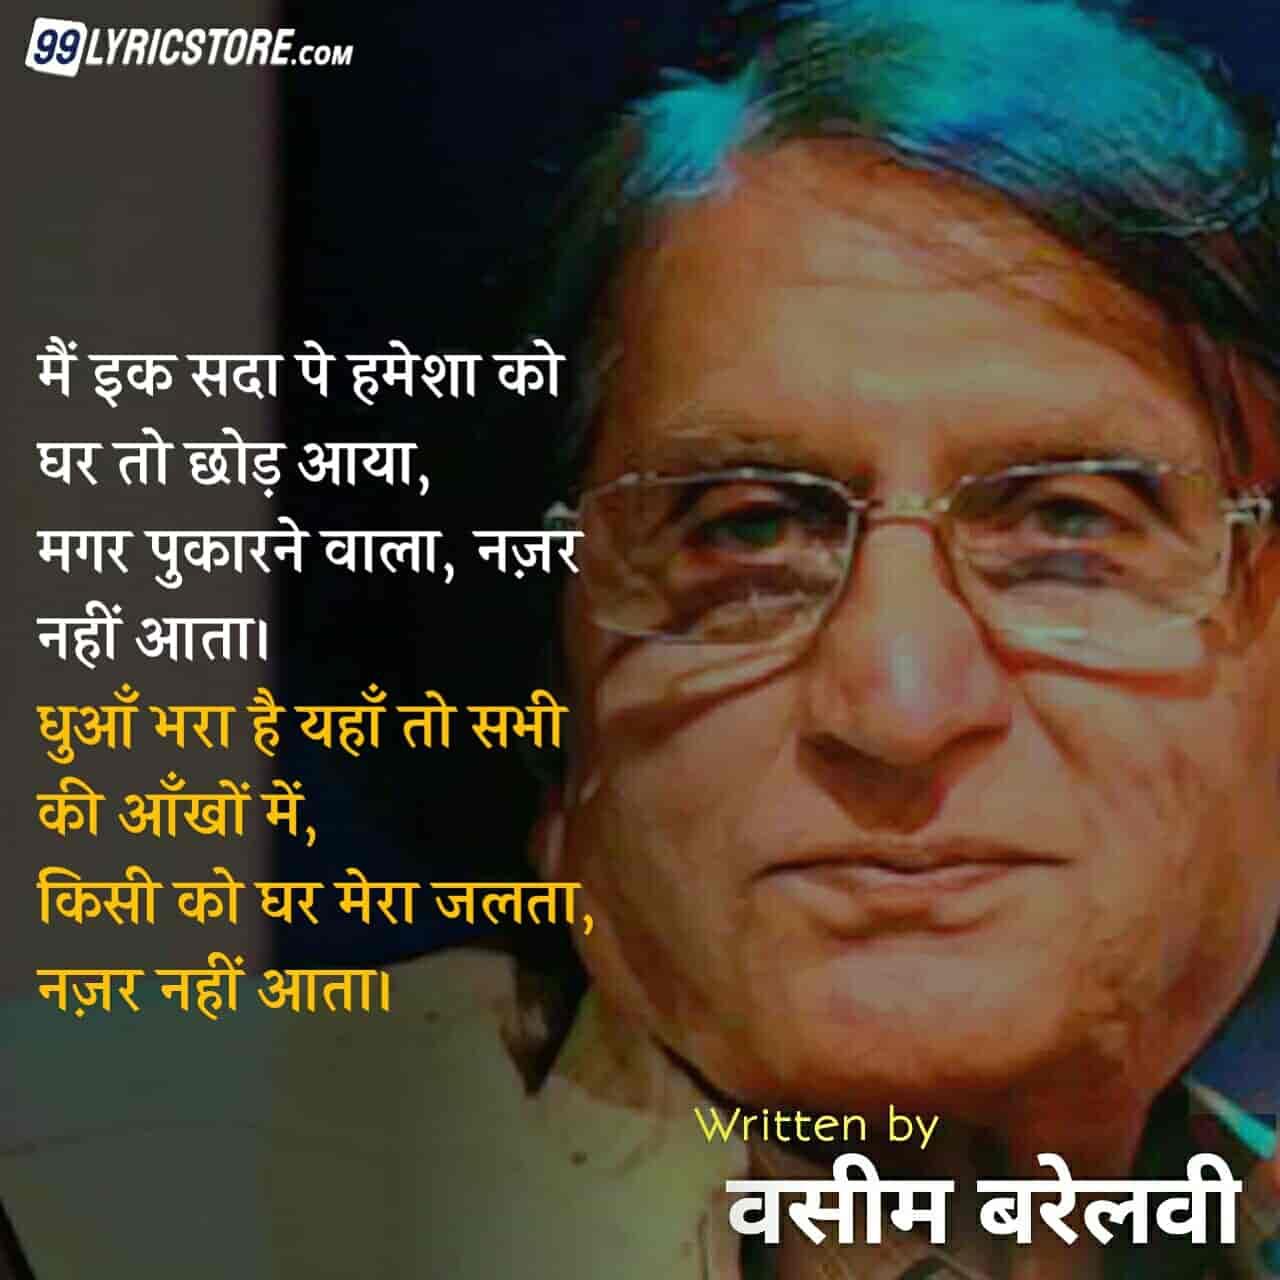 This beautiful Ghazal 'Main Apne Khwab Se Bichhda Nazar Nahin Aata' has written  by Waseem Barelvi.